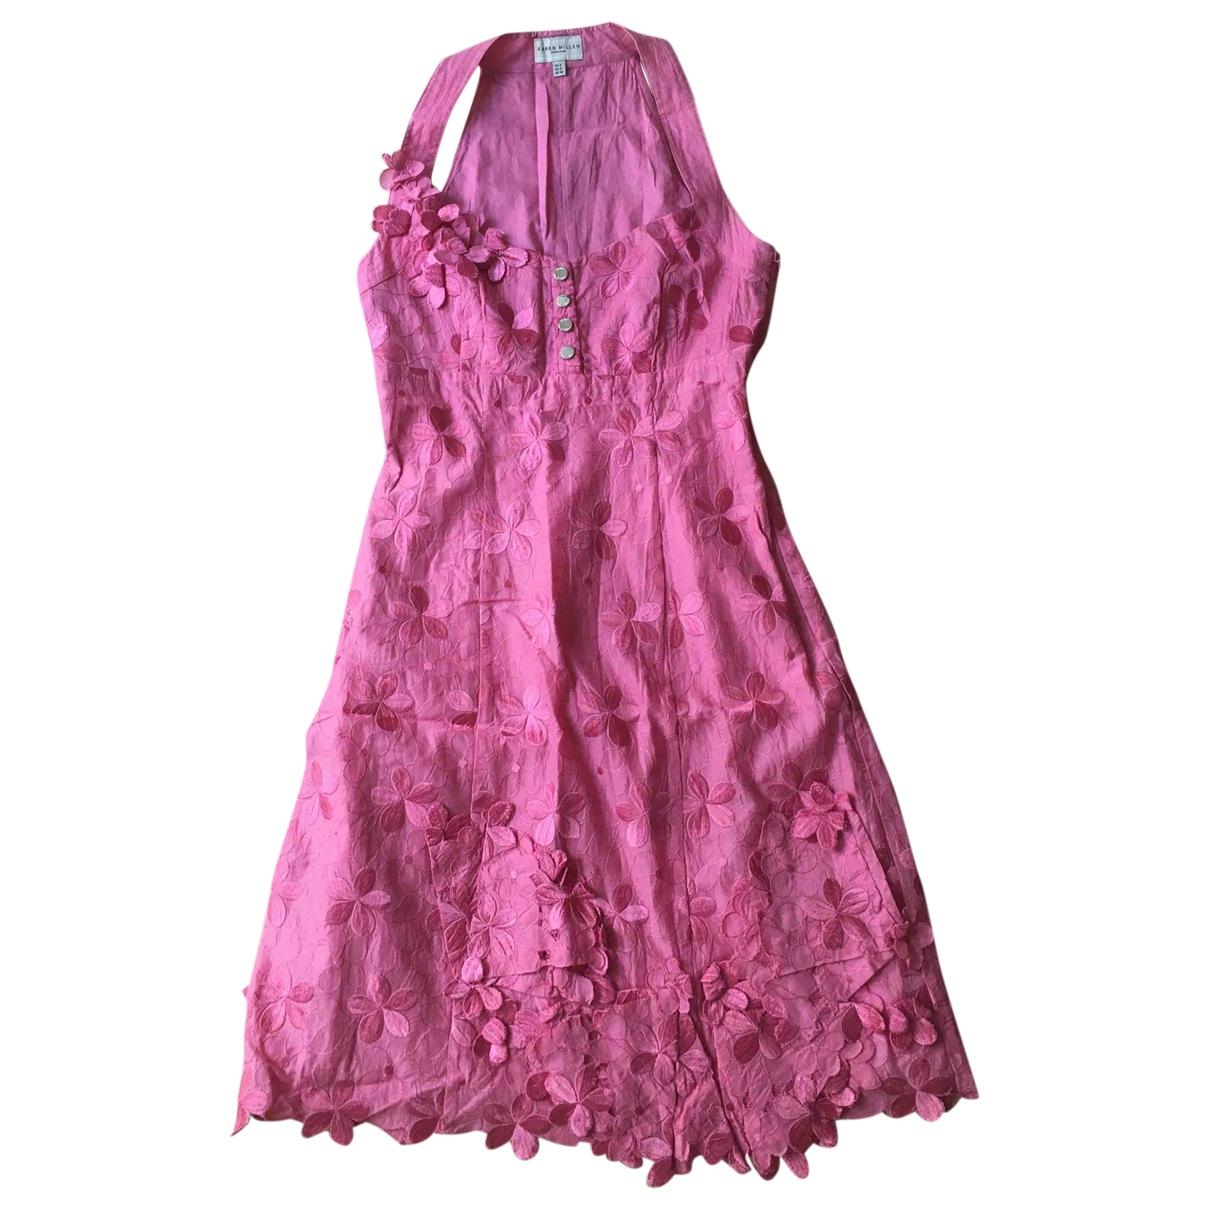 Karen Millen \N Pink Cotton dress for Women 8 UK